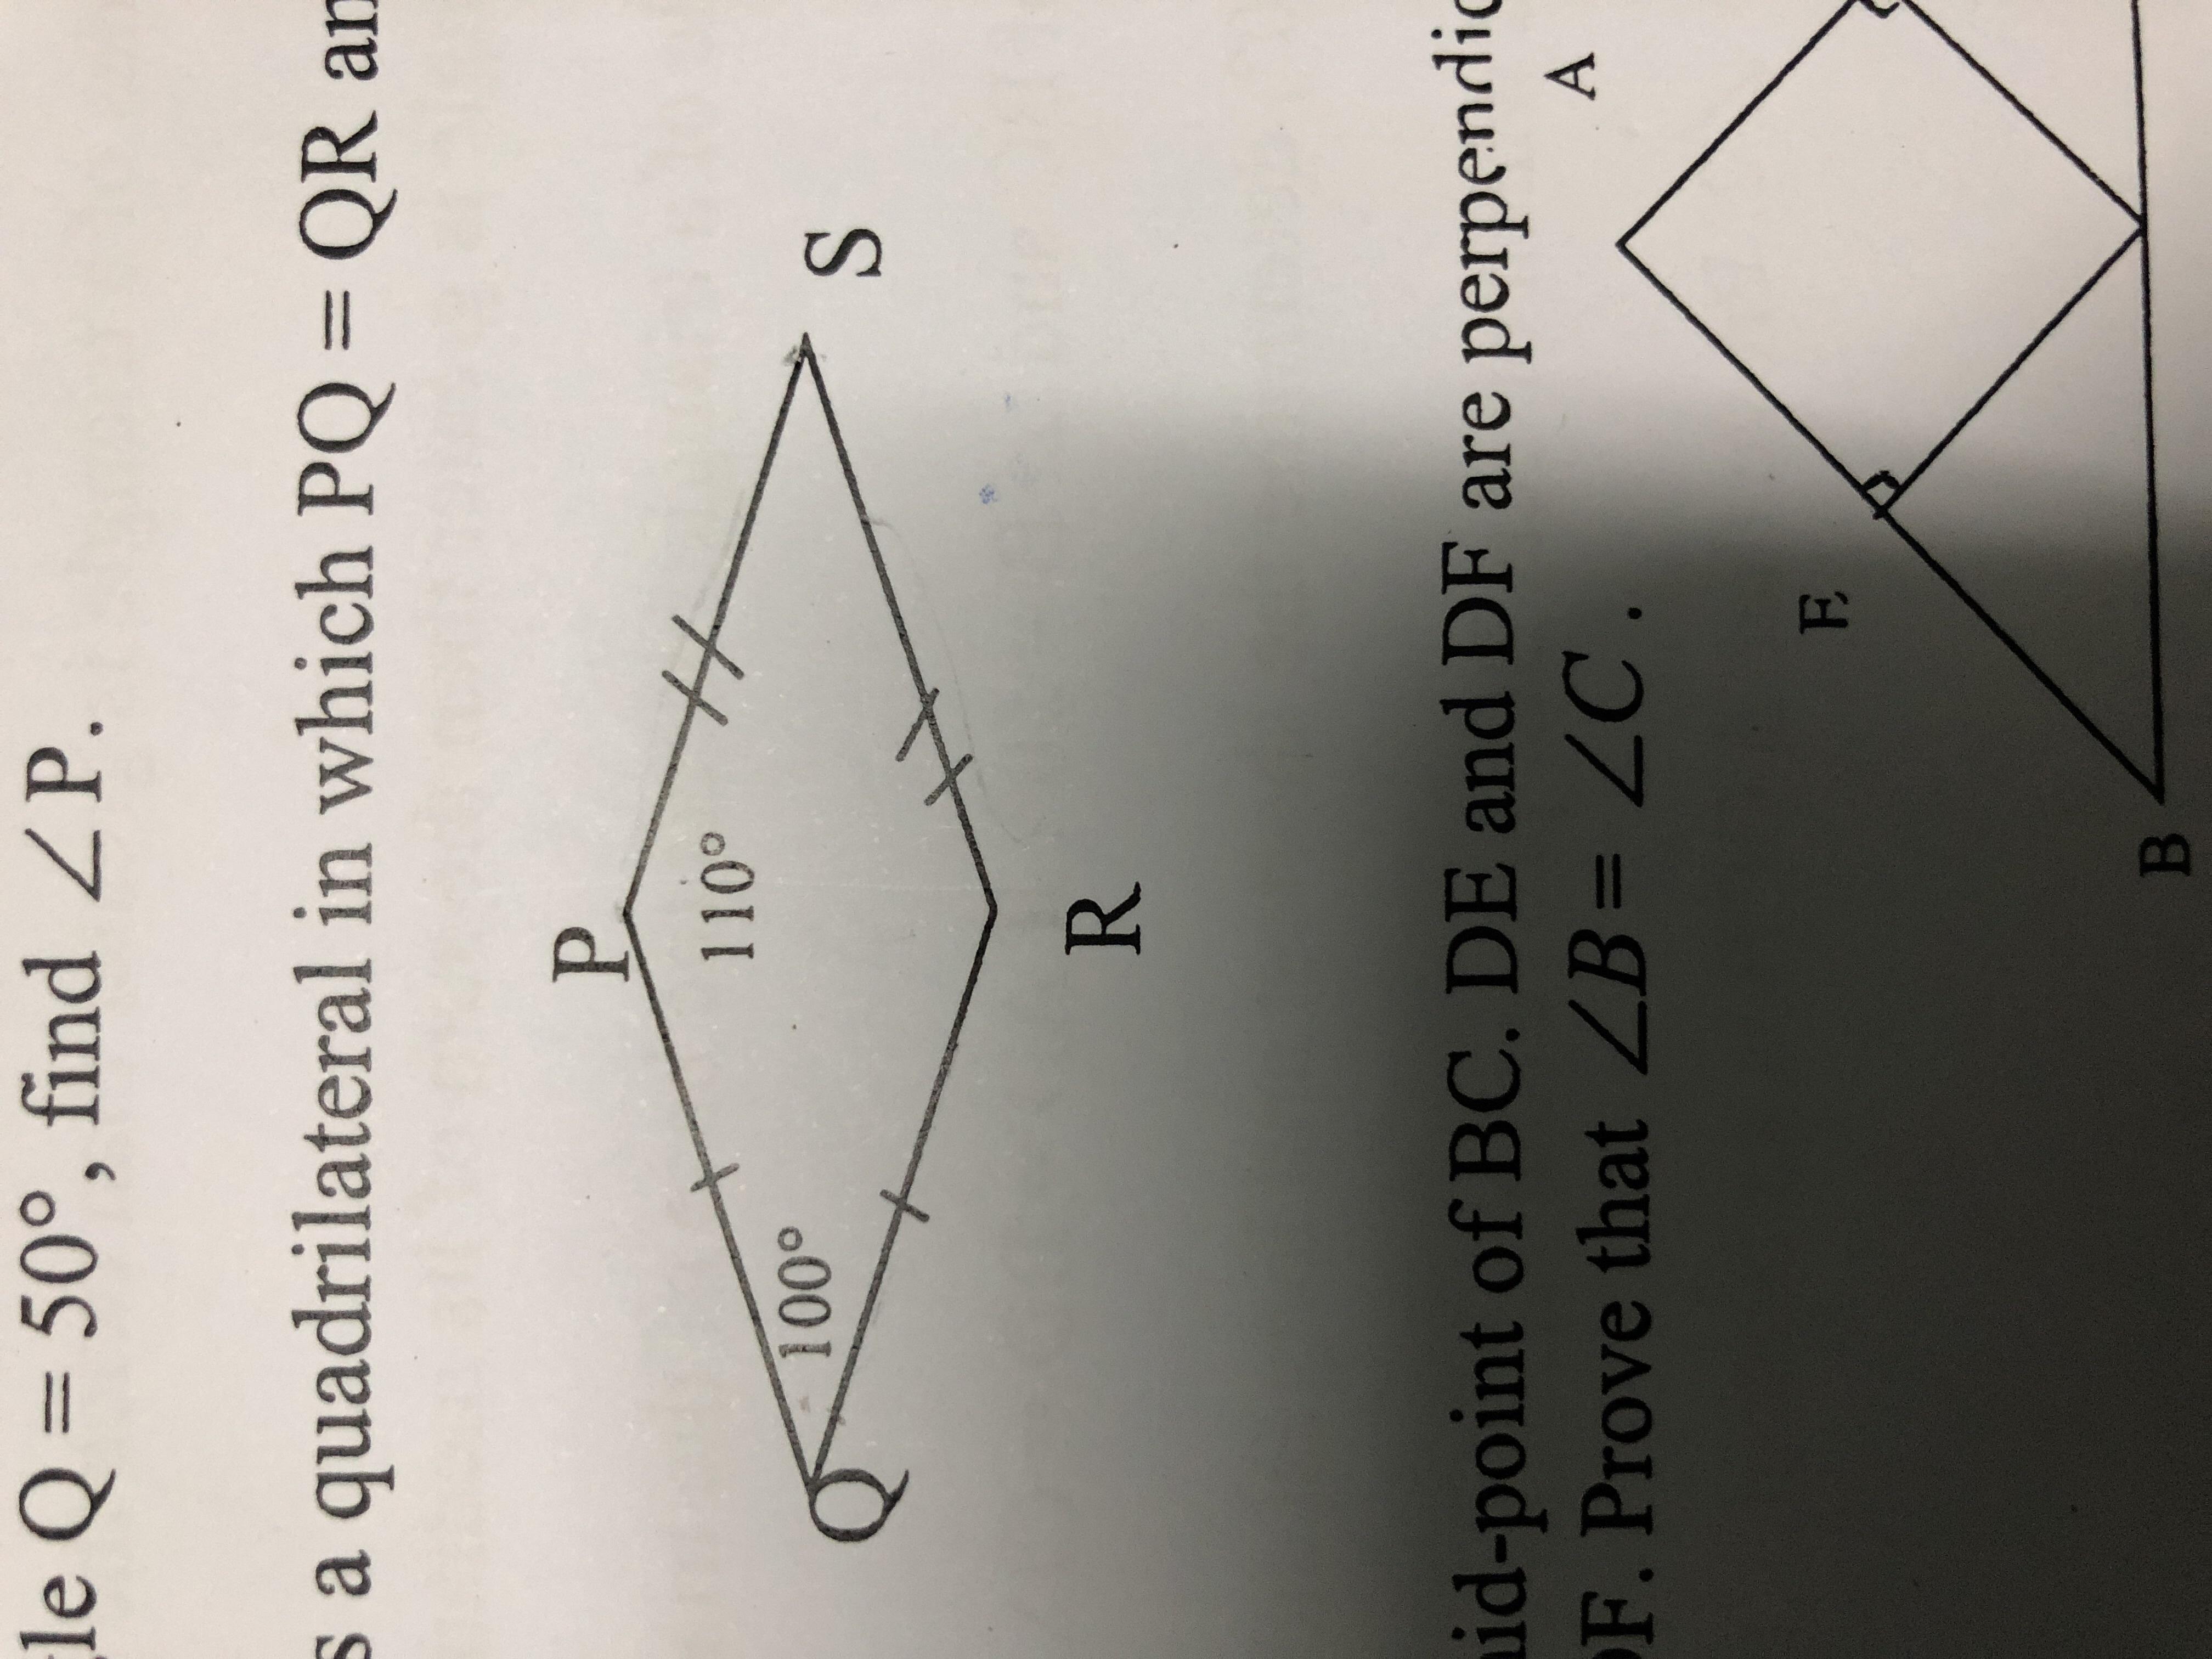 Construct a quadrilateral PQRS where PQ = 5.6 cm, angle Q